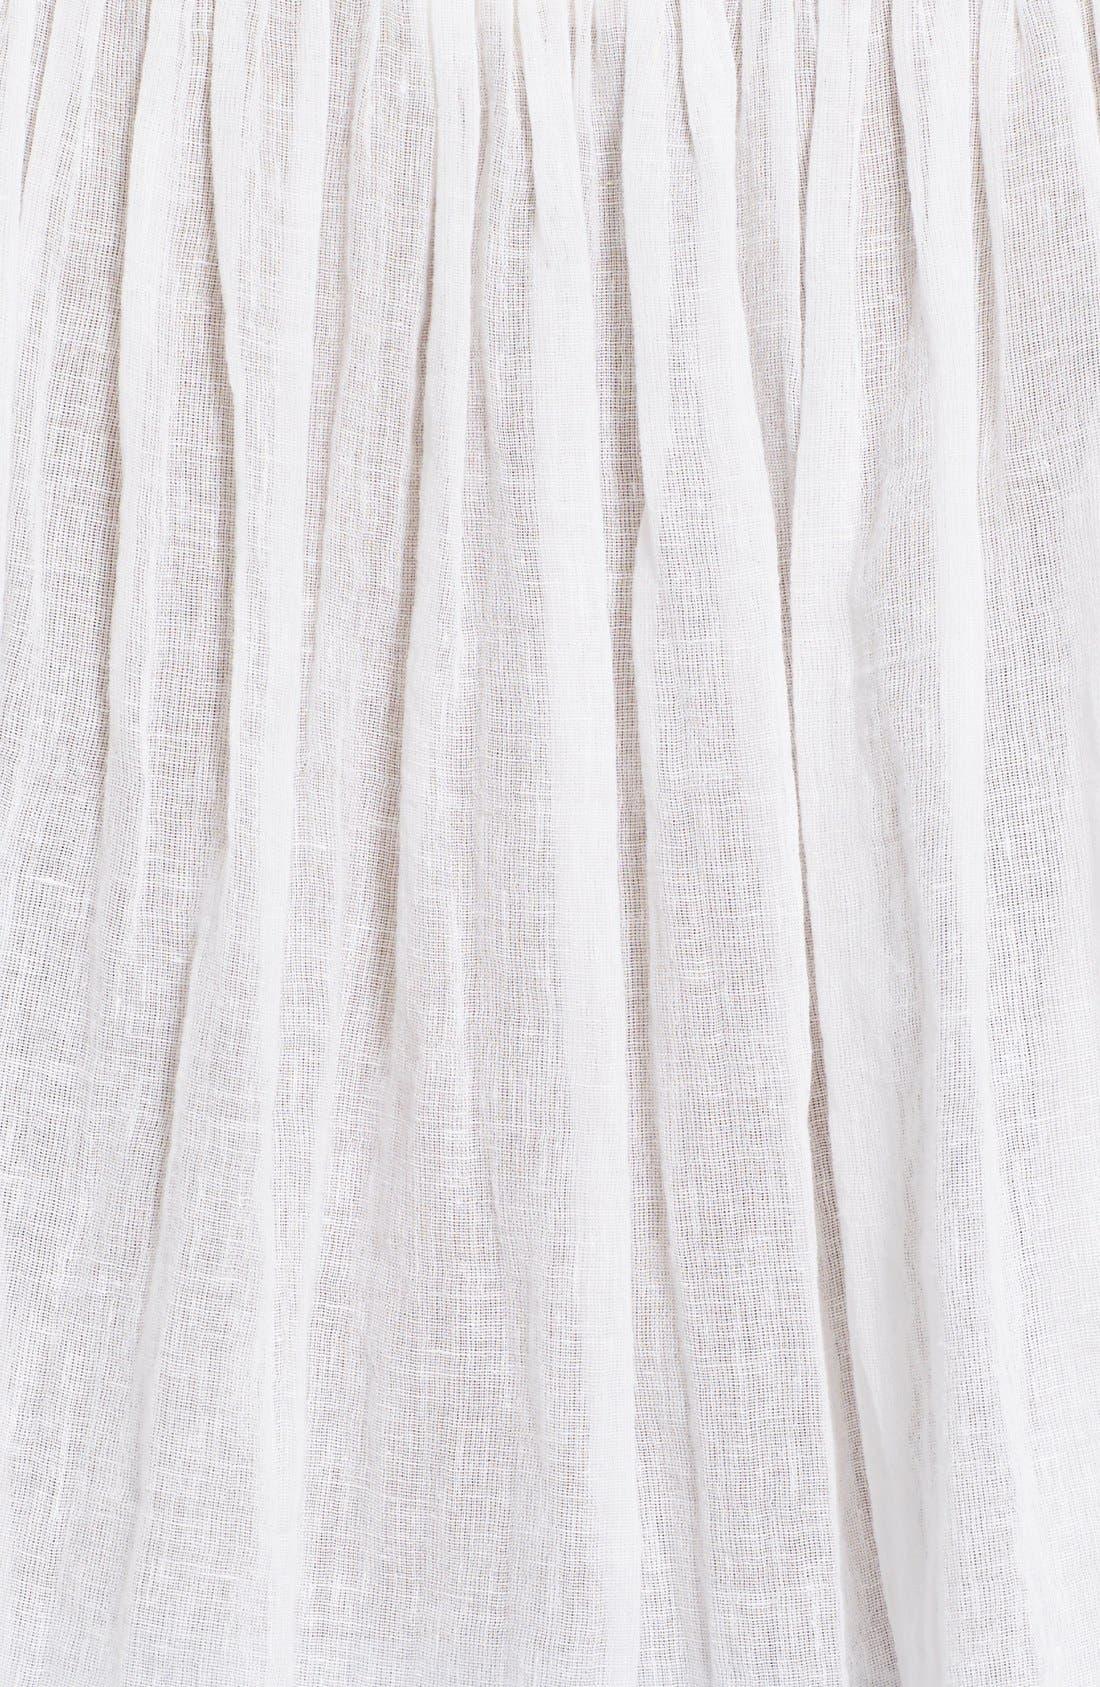 Alternate Image 5  - Rebecca Taylor Lace Trim Woven Peasant Top